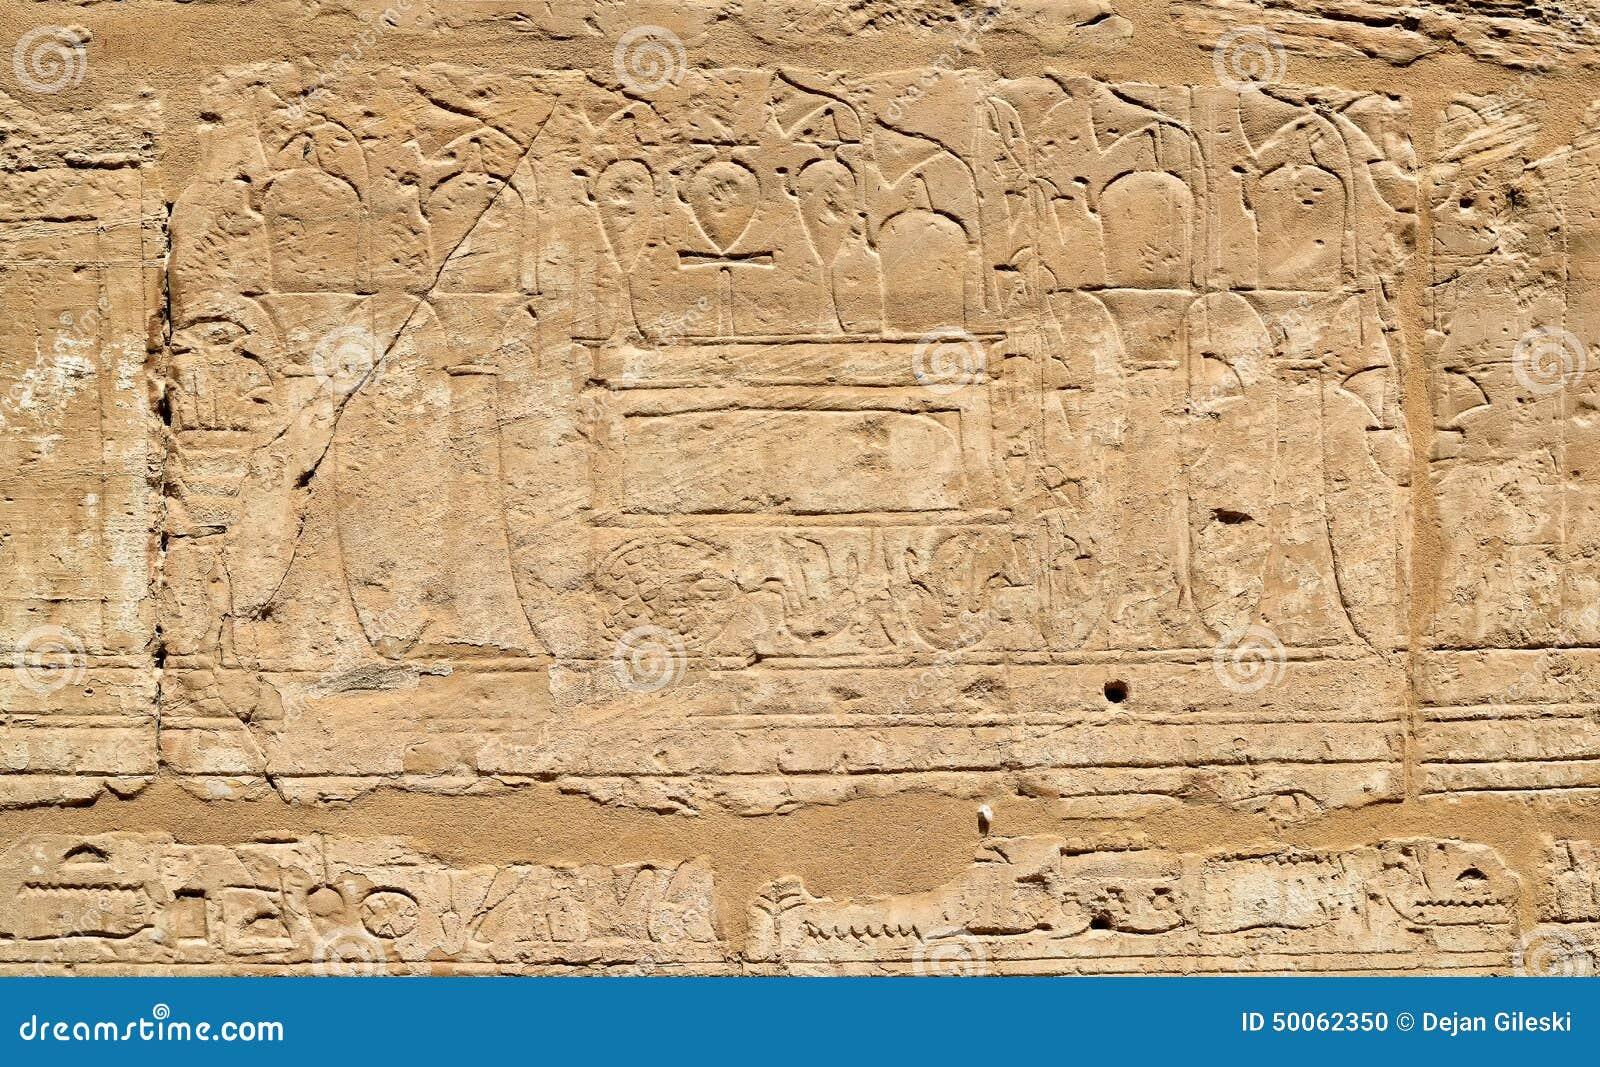 egypt hieroglyph wall of ancient karnak temple stock photo